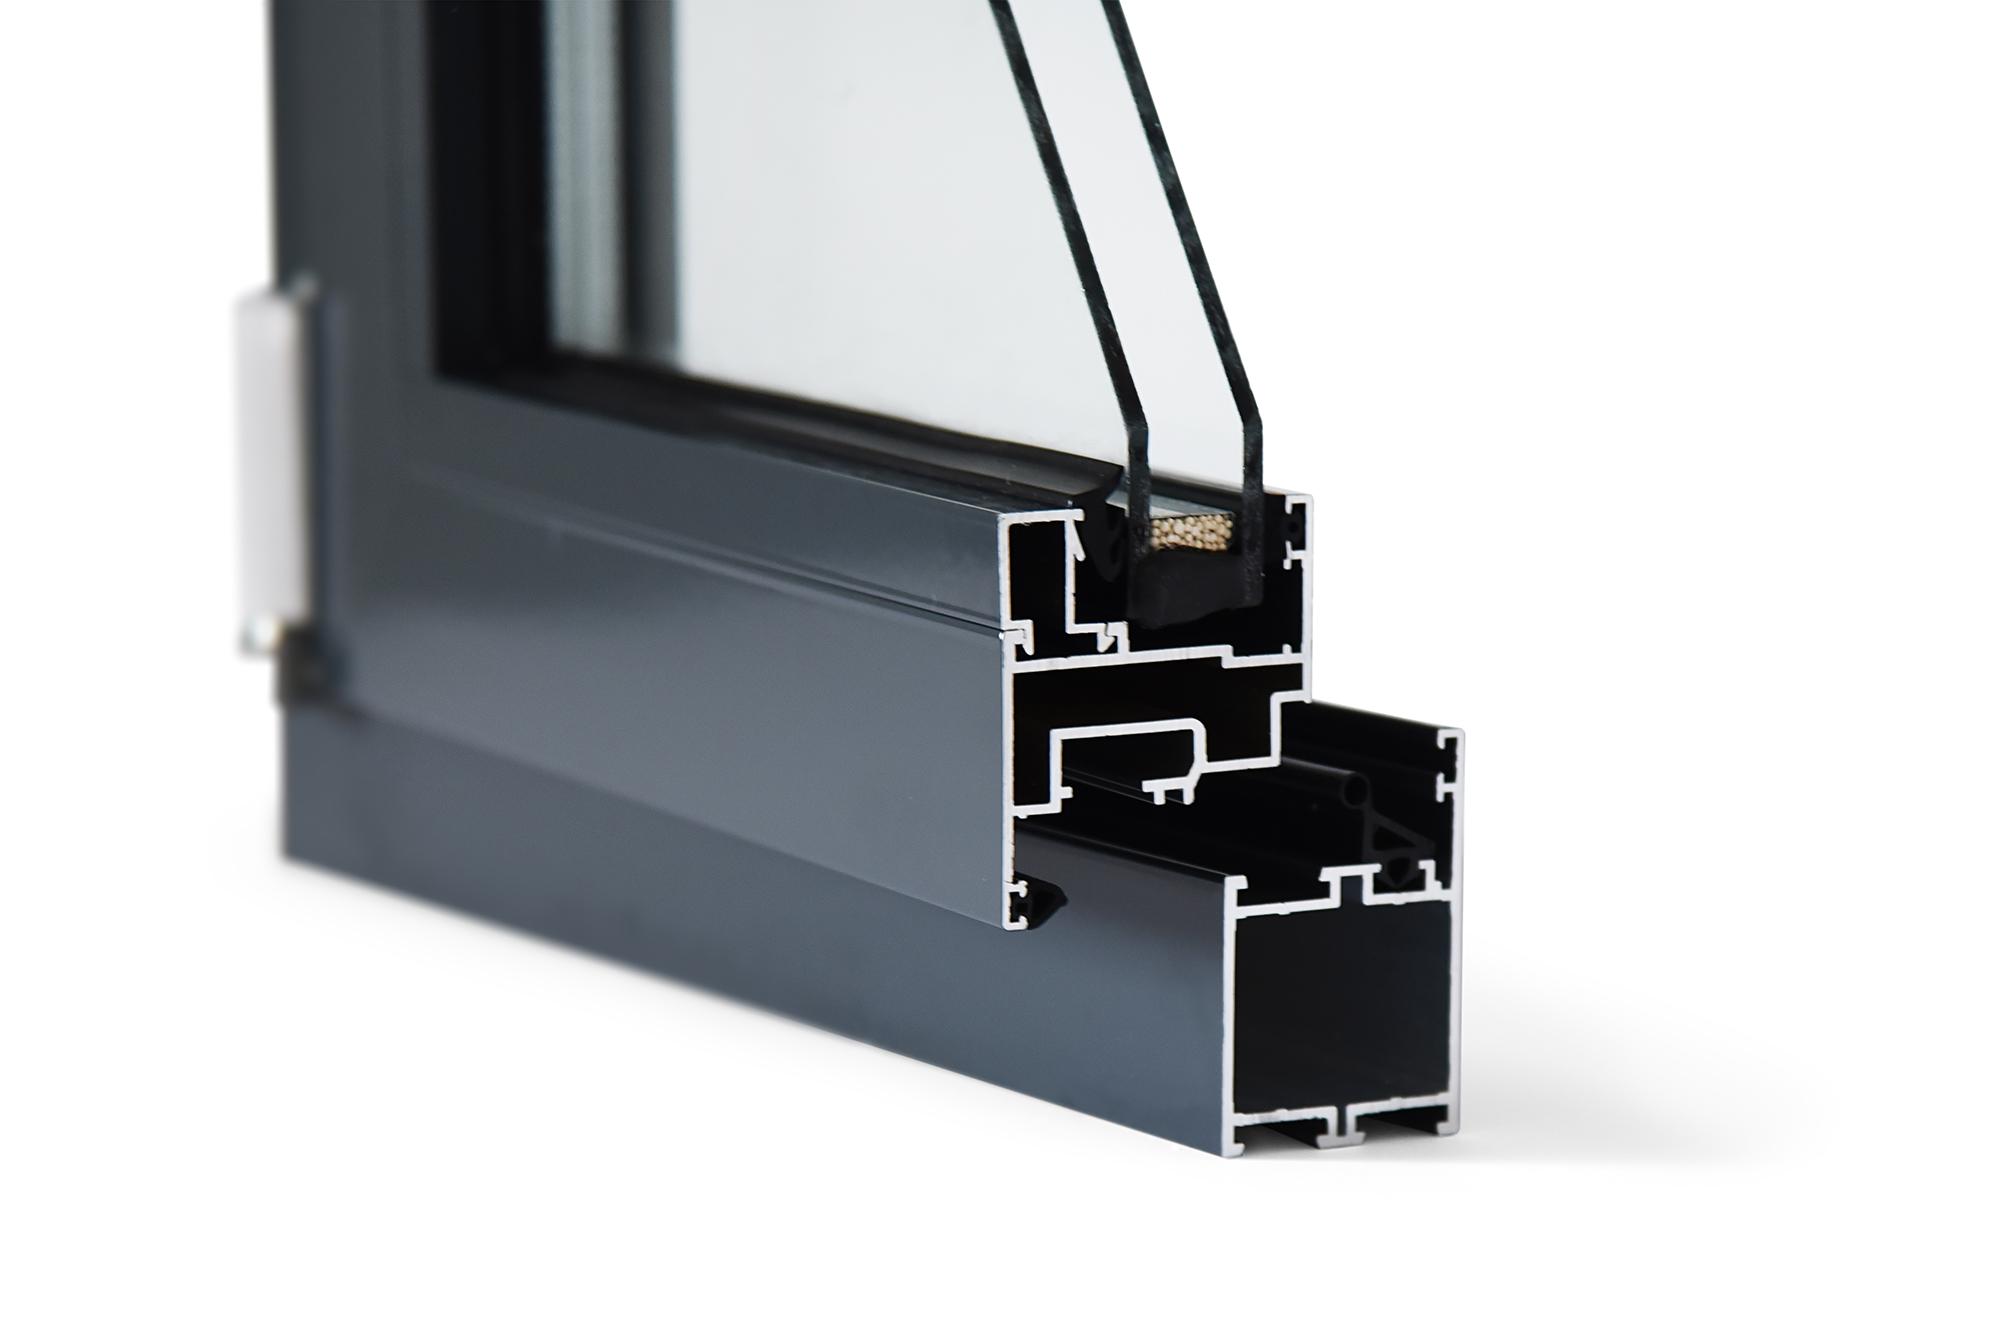 Fenster Ral 7016 aluminiumfenster drutex alu mb 45 fenster ral7016 anthrazit shop